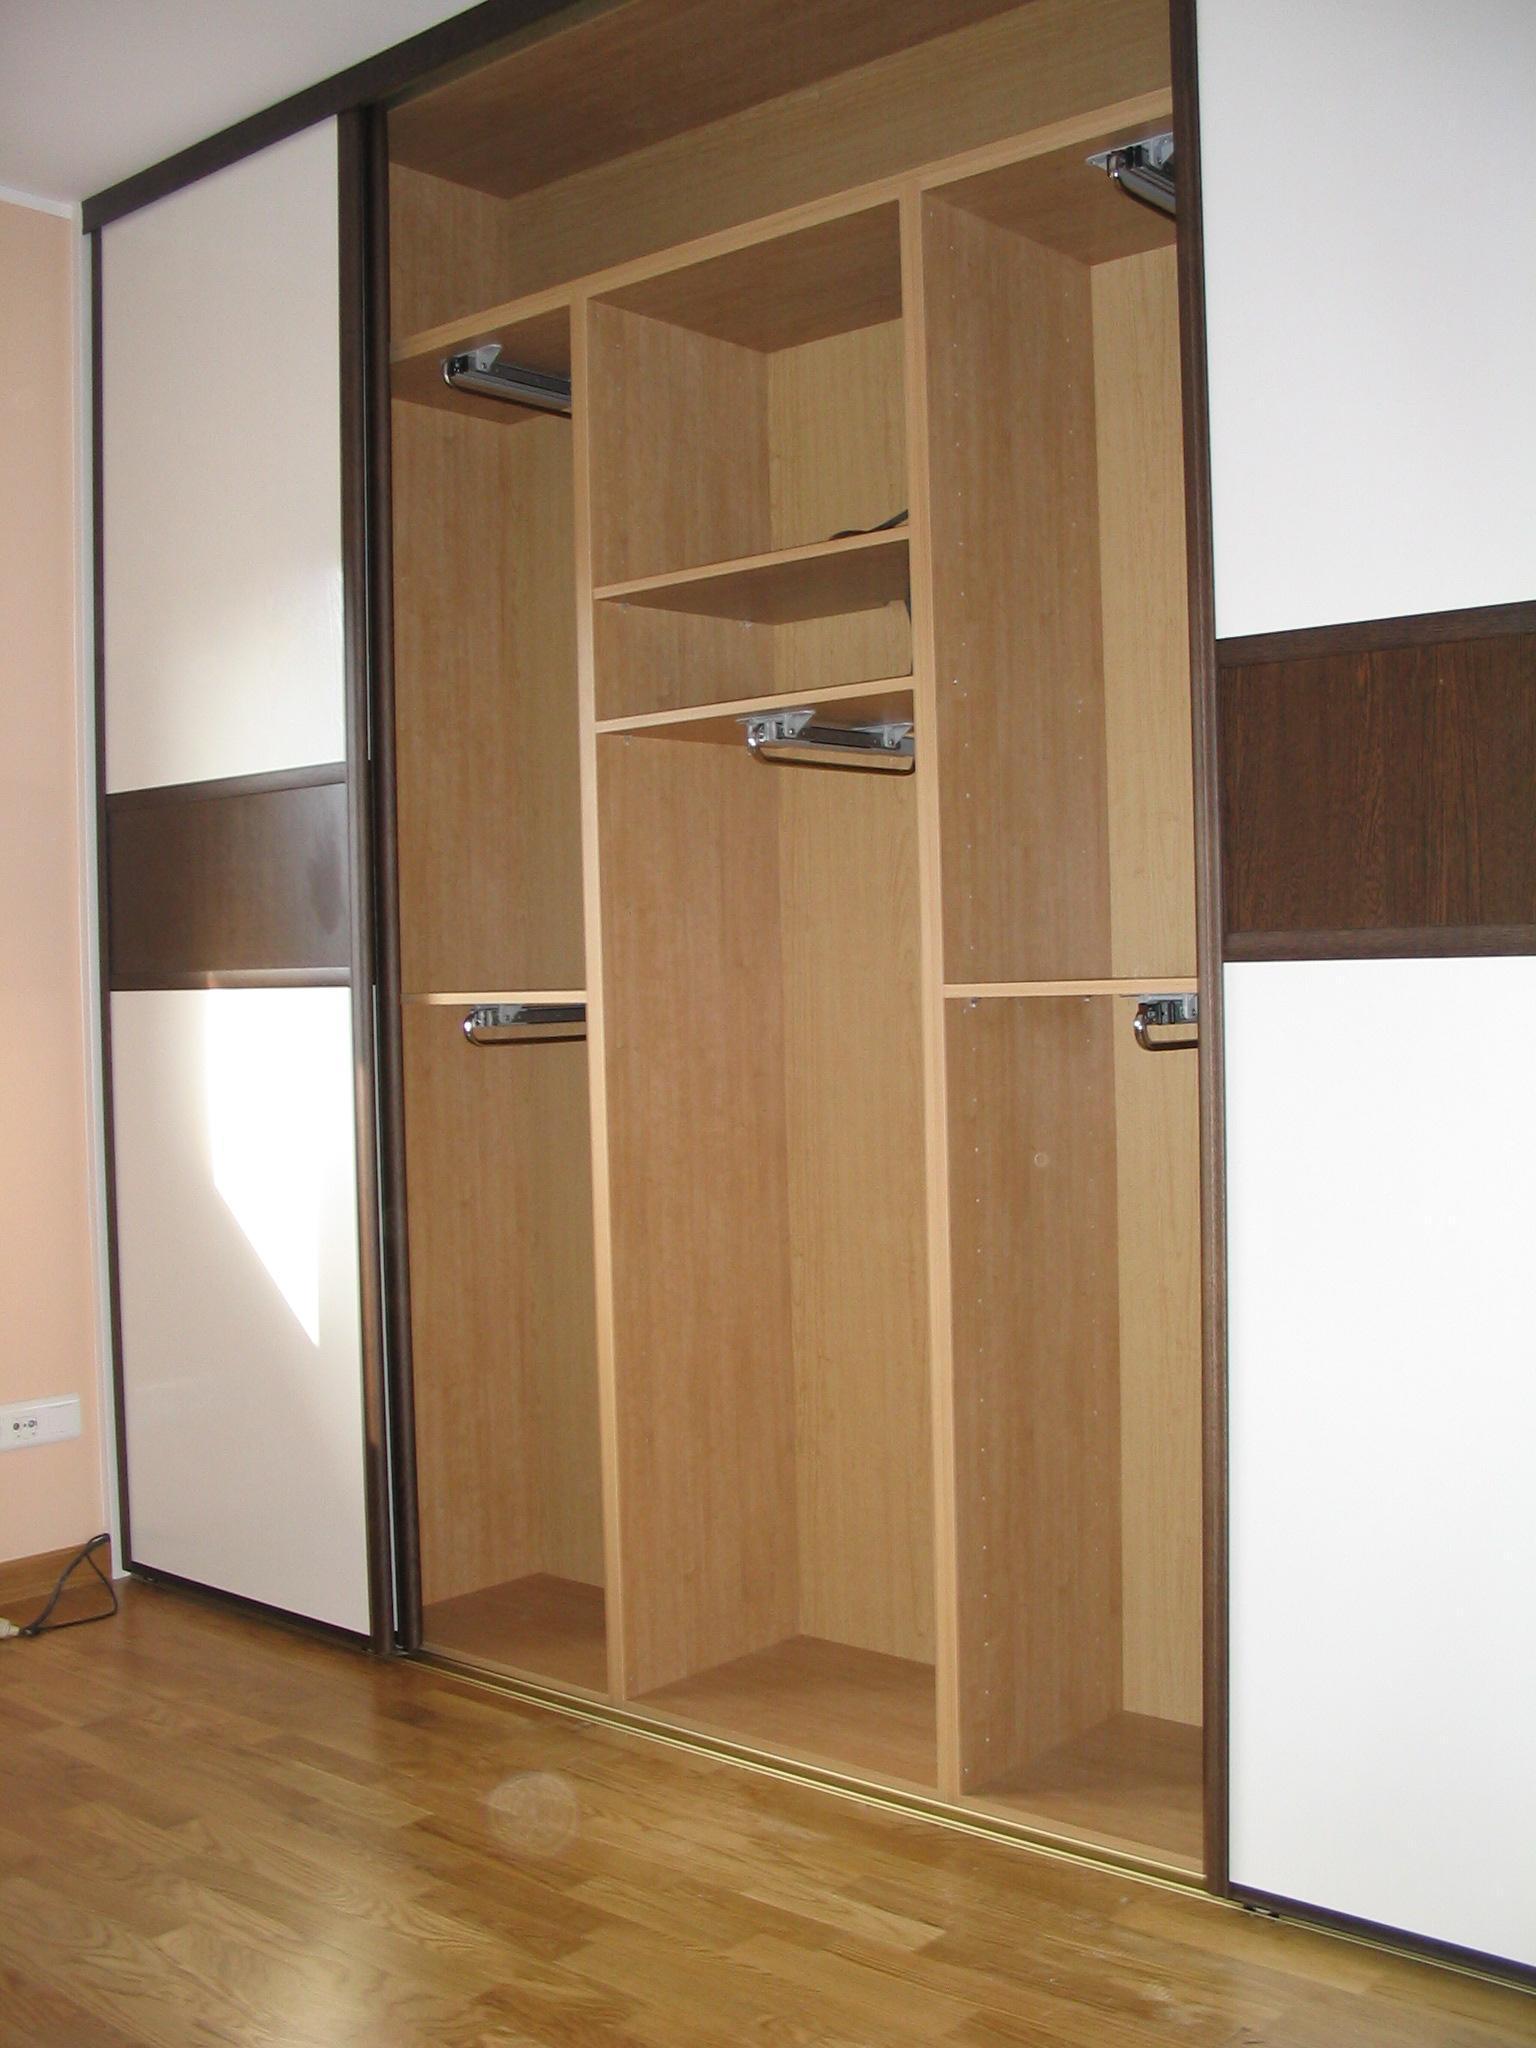 Armarios empotrados con puertas correderas o abatibles - Fotos armarios empotrados puertas correderas ...